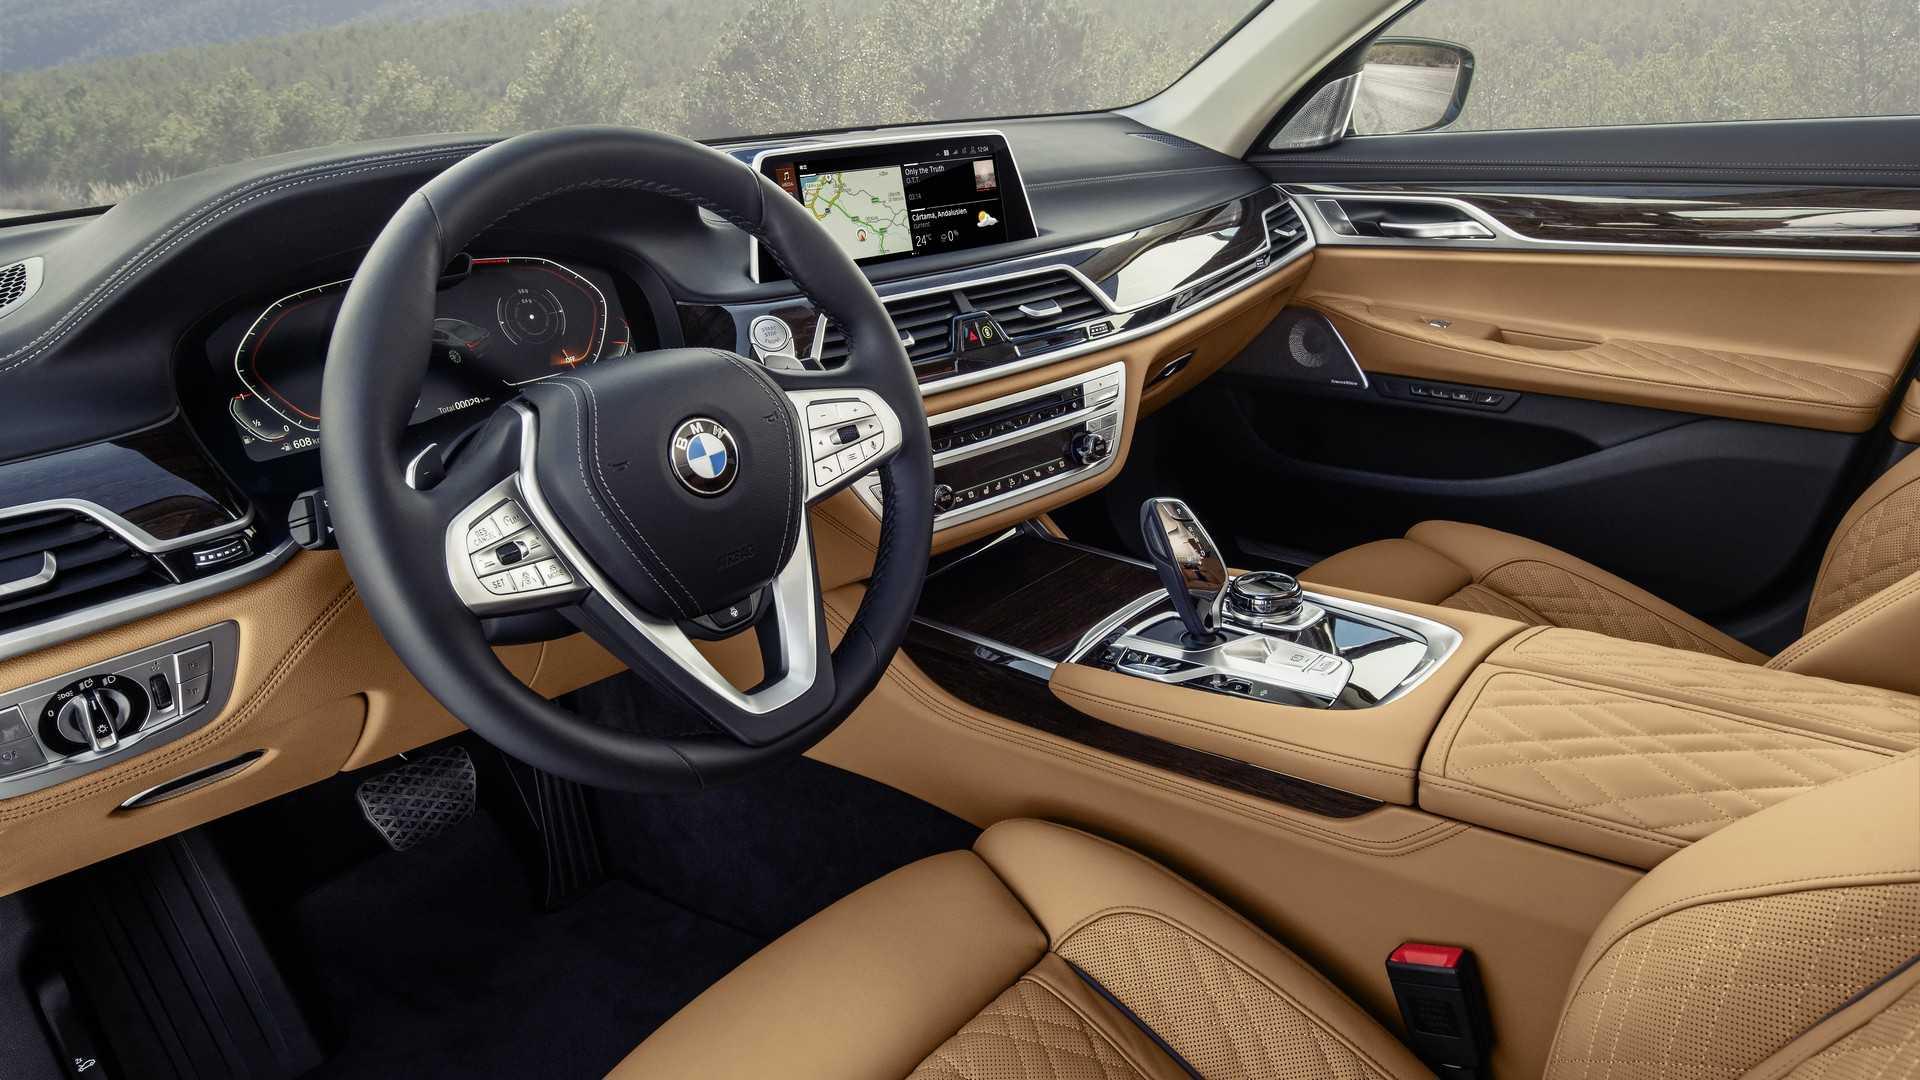 BMW 5 series салон